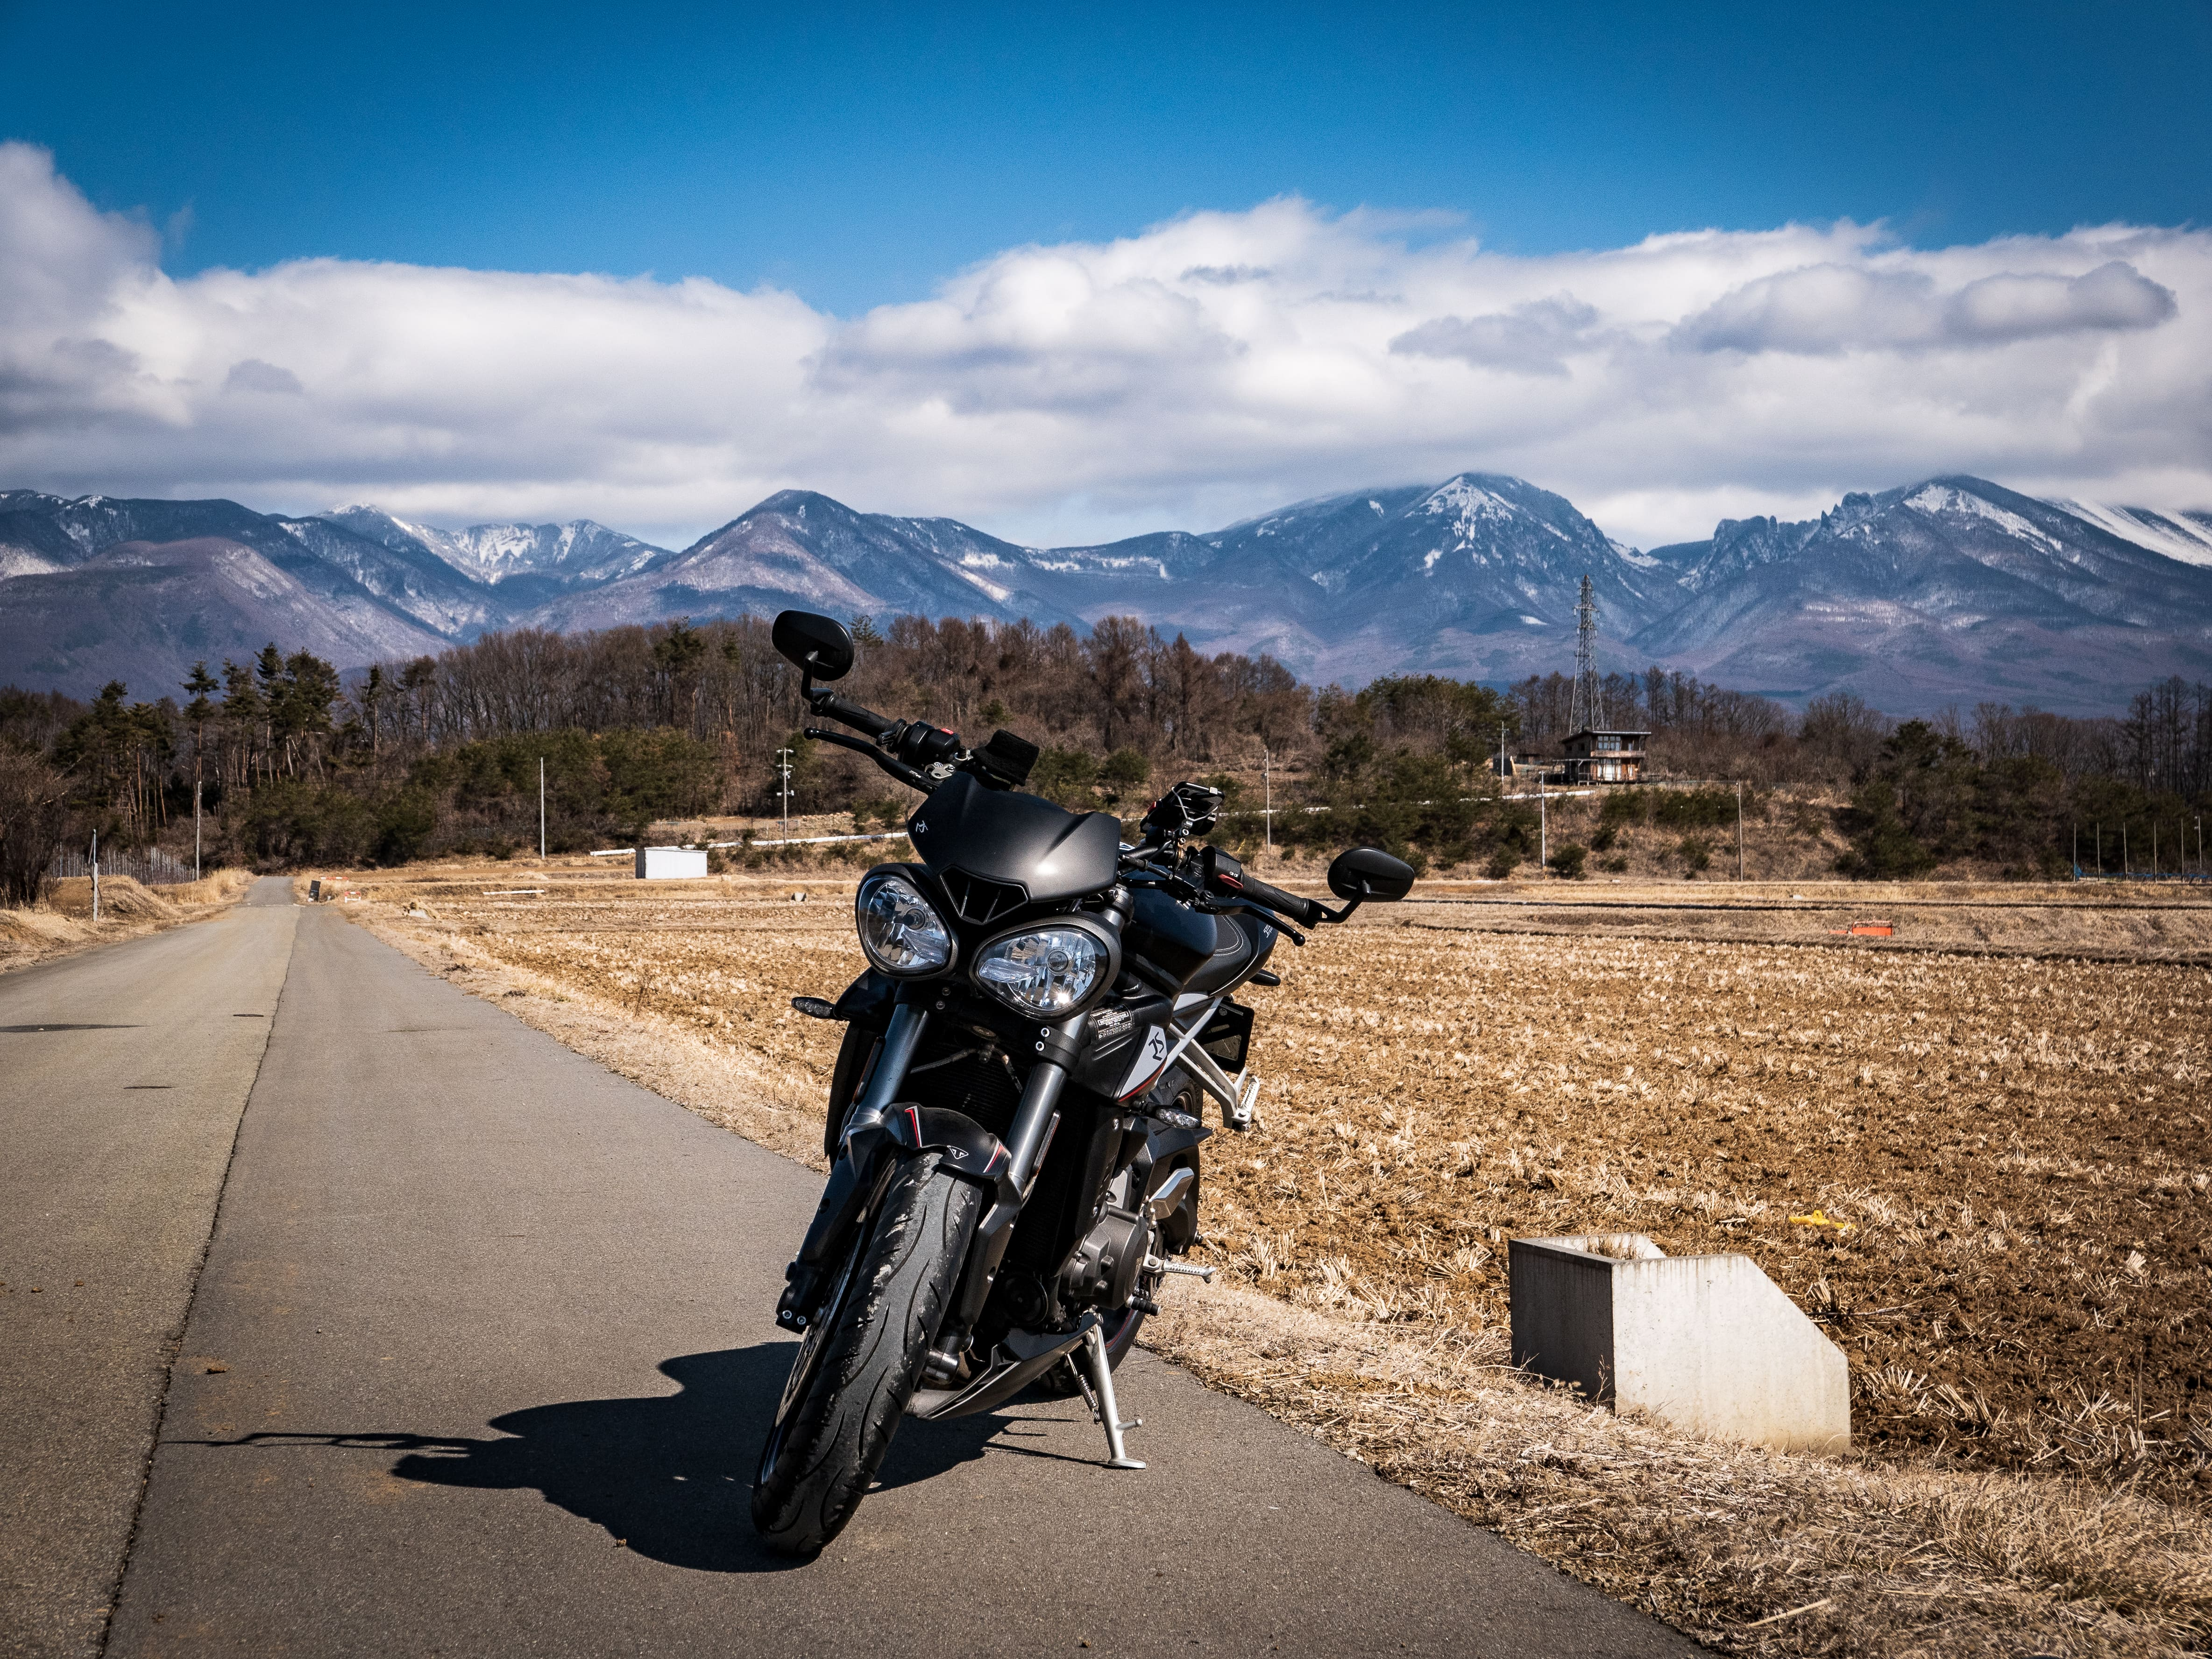 f:id:gaku-bikelife:20200304152157j:plain